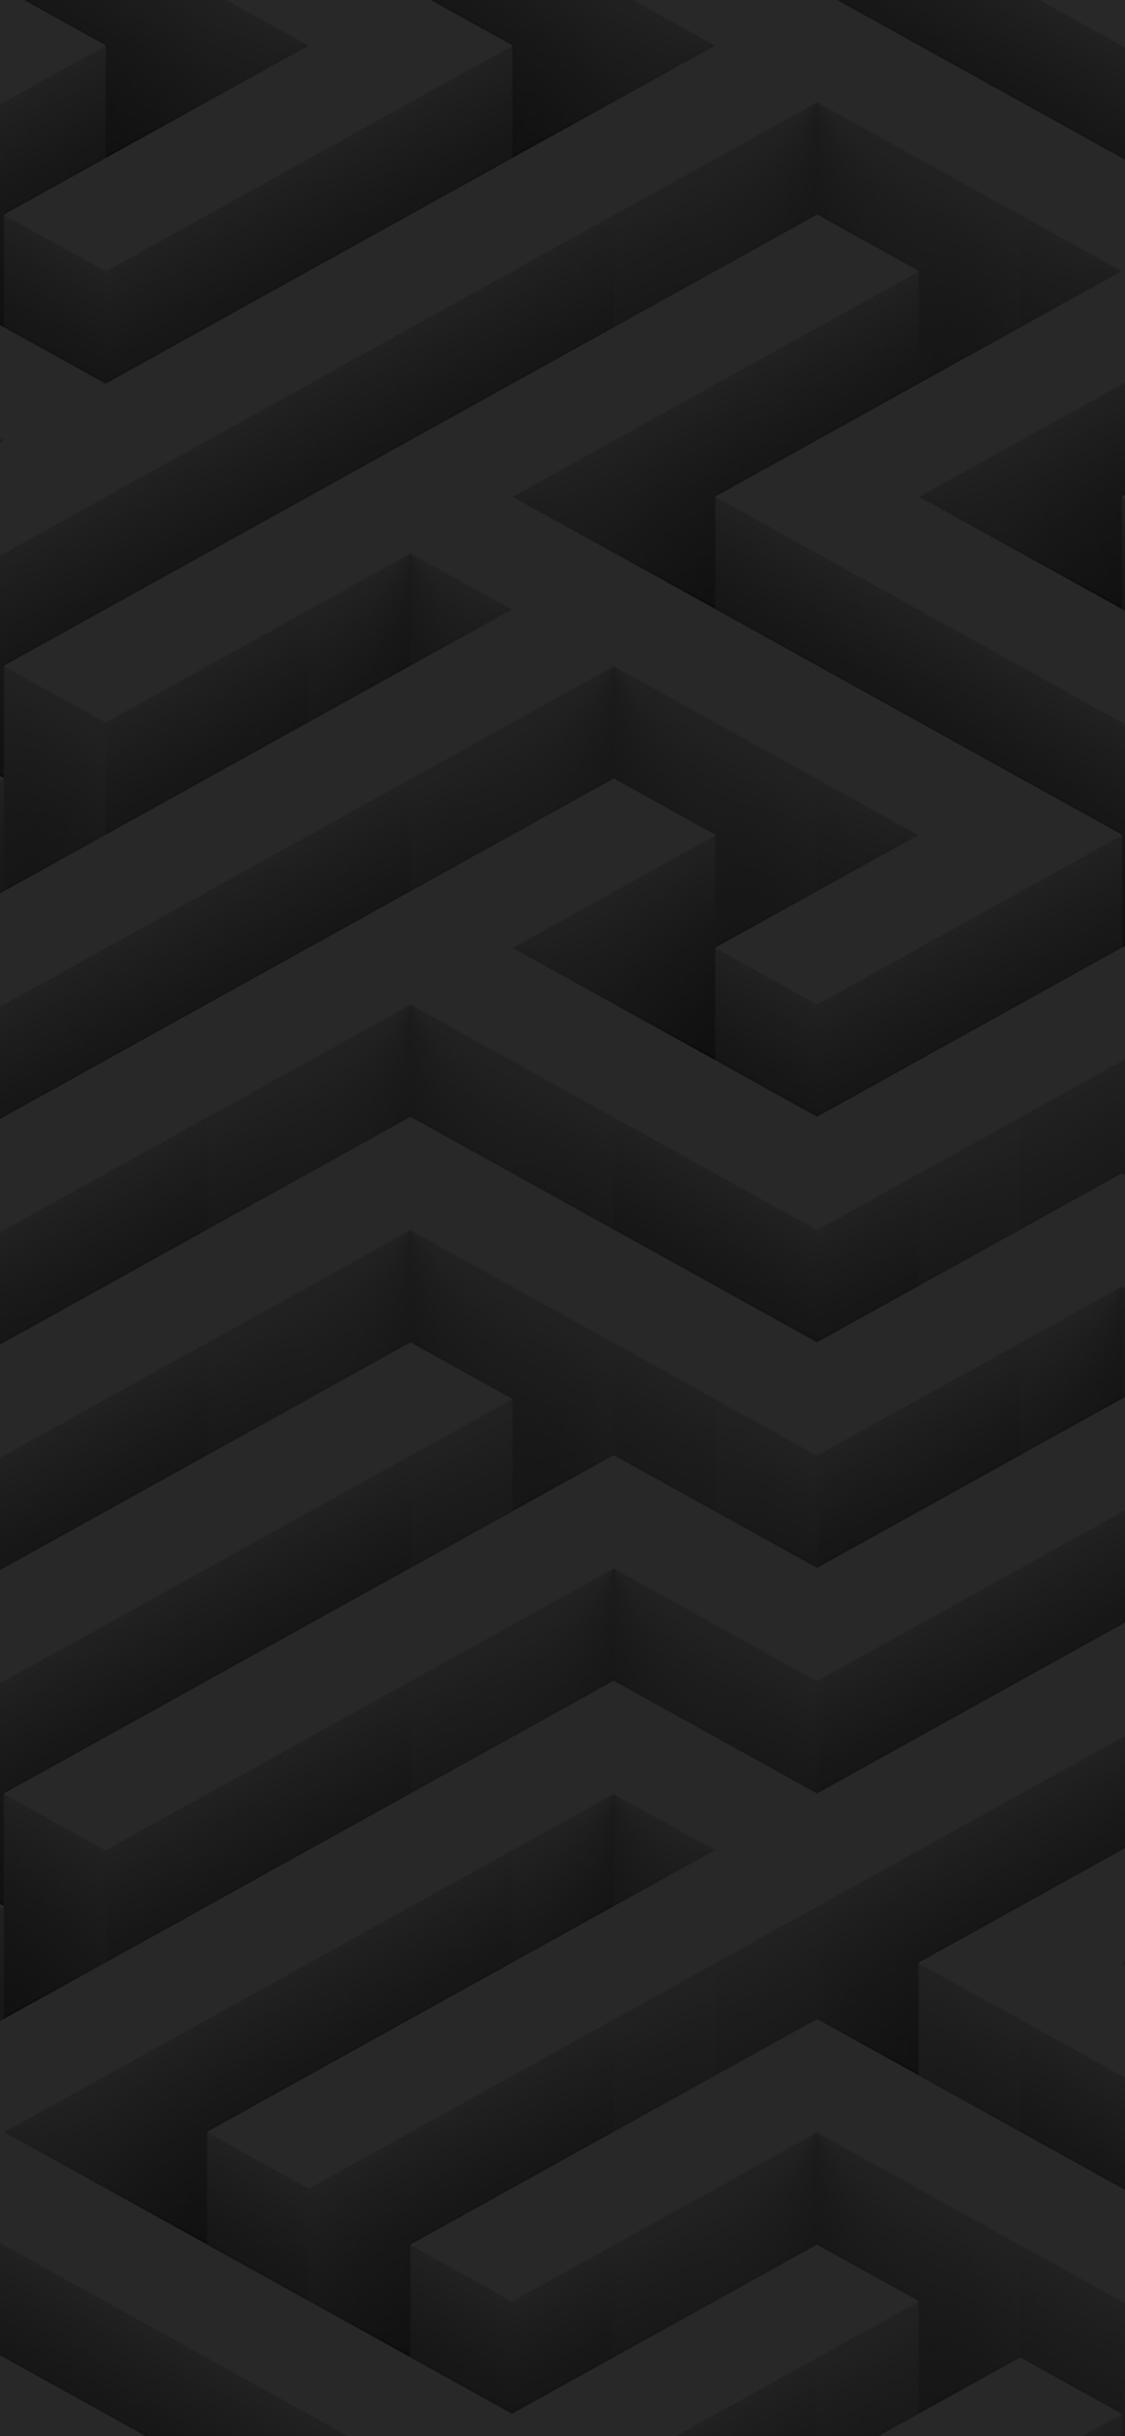 iPhoneXpapers.com-Apple-iPhone-wallpaper-ve67-maze-art-dark-abstract-patterns